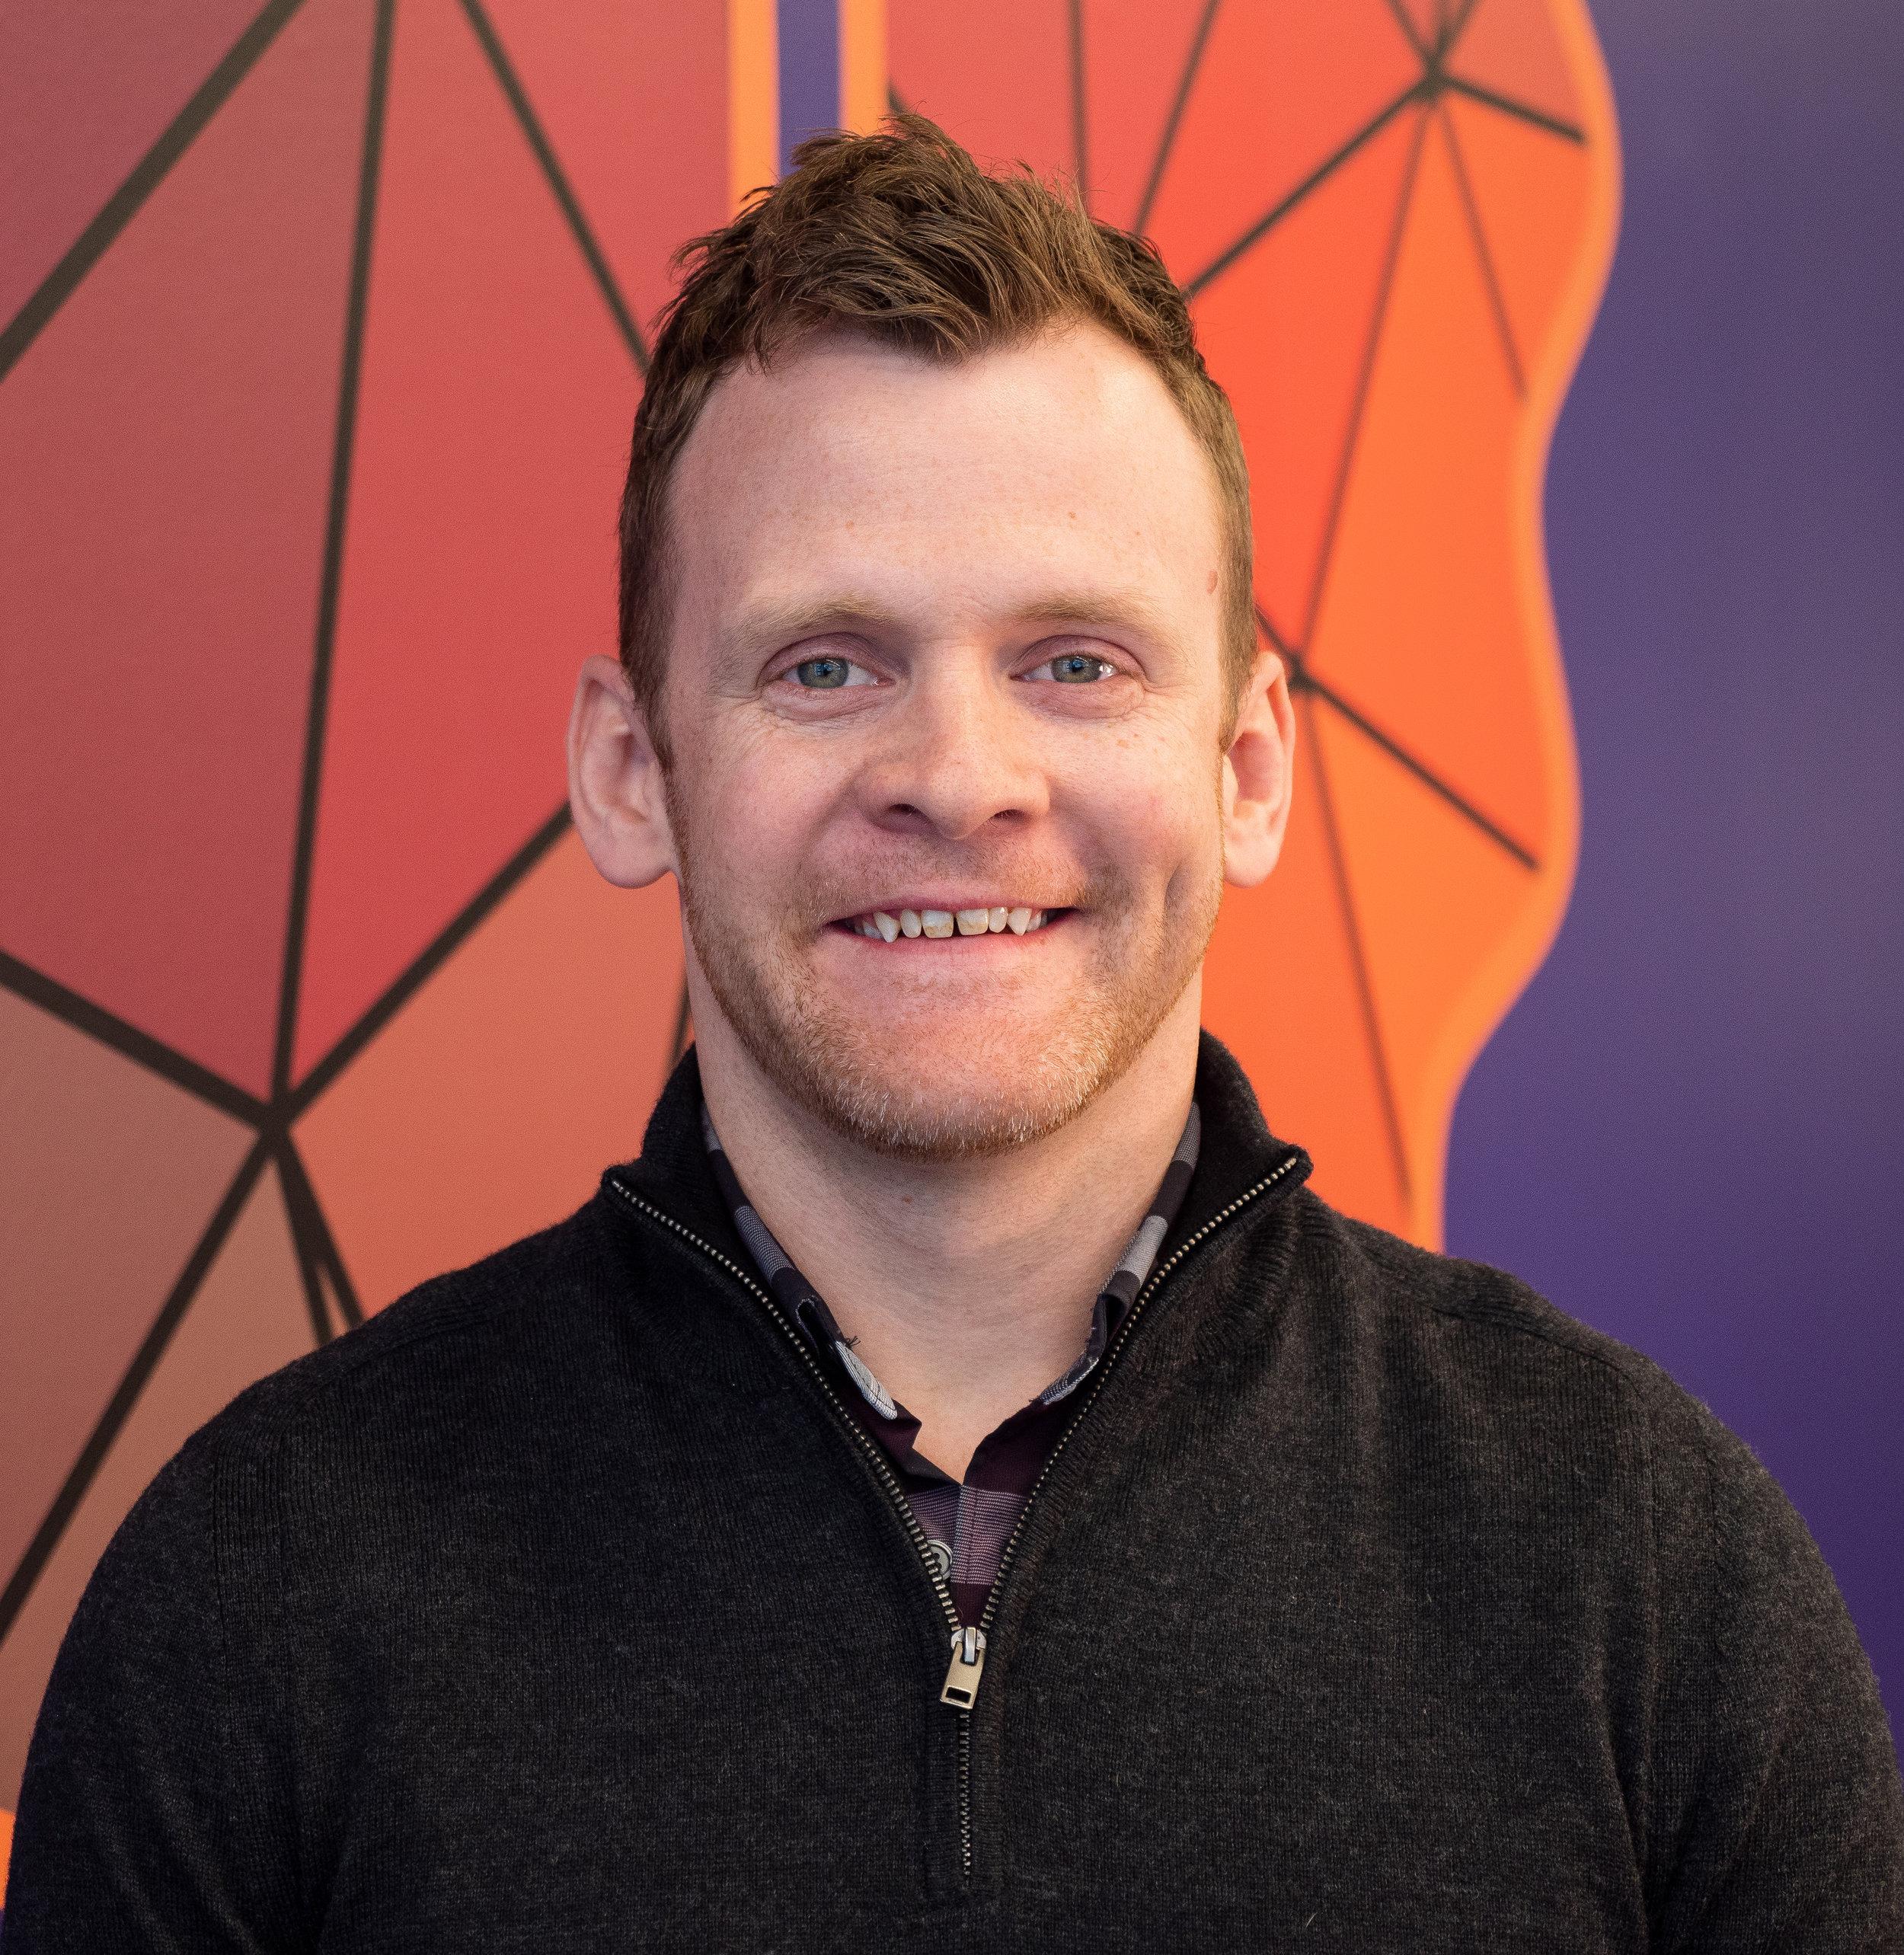 Joshua Setzer   Co-Founder and CEO